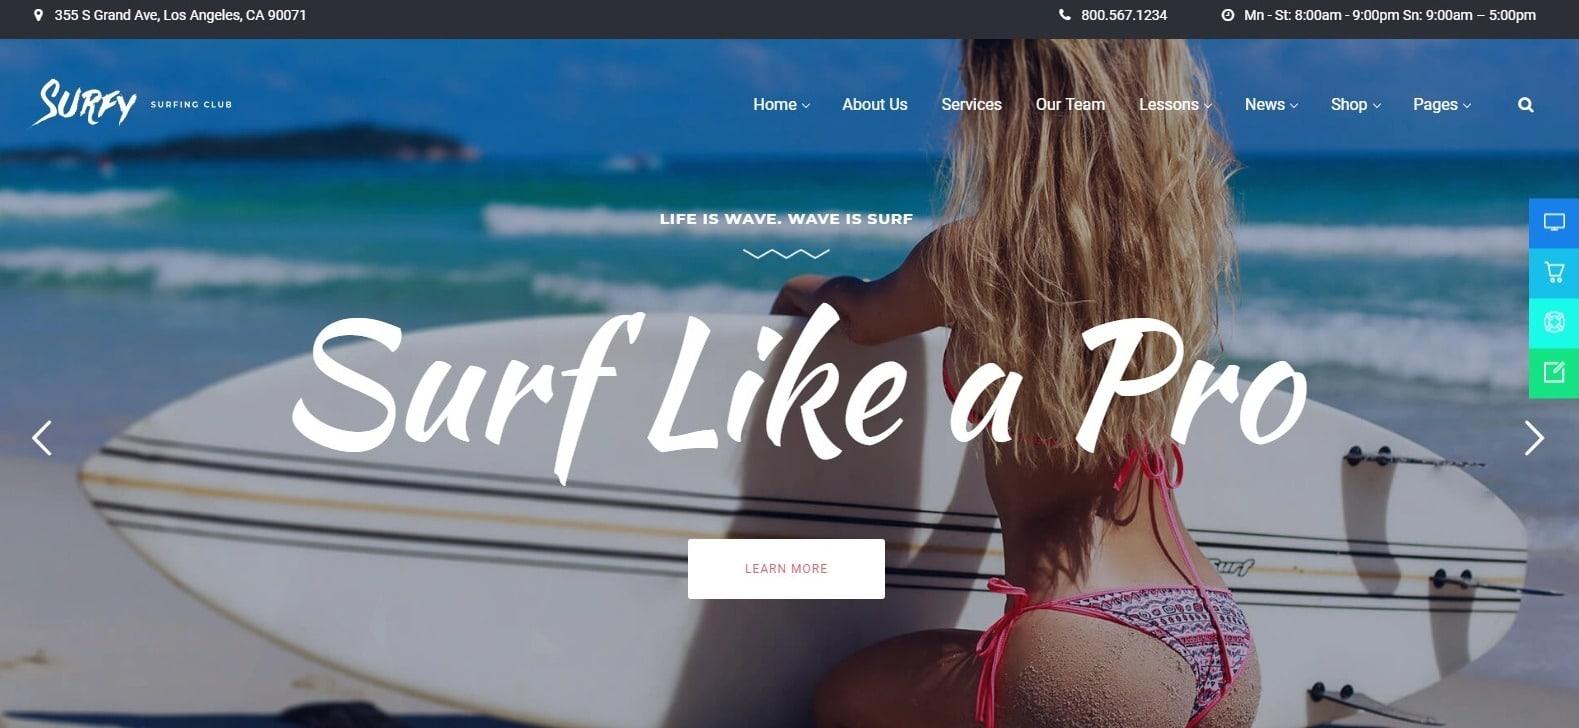 surfy-sports-website-template